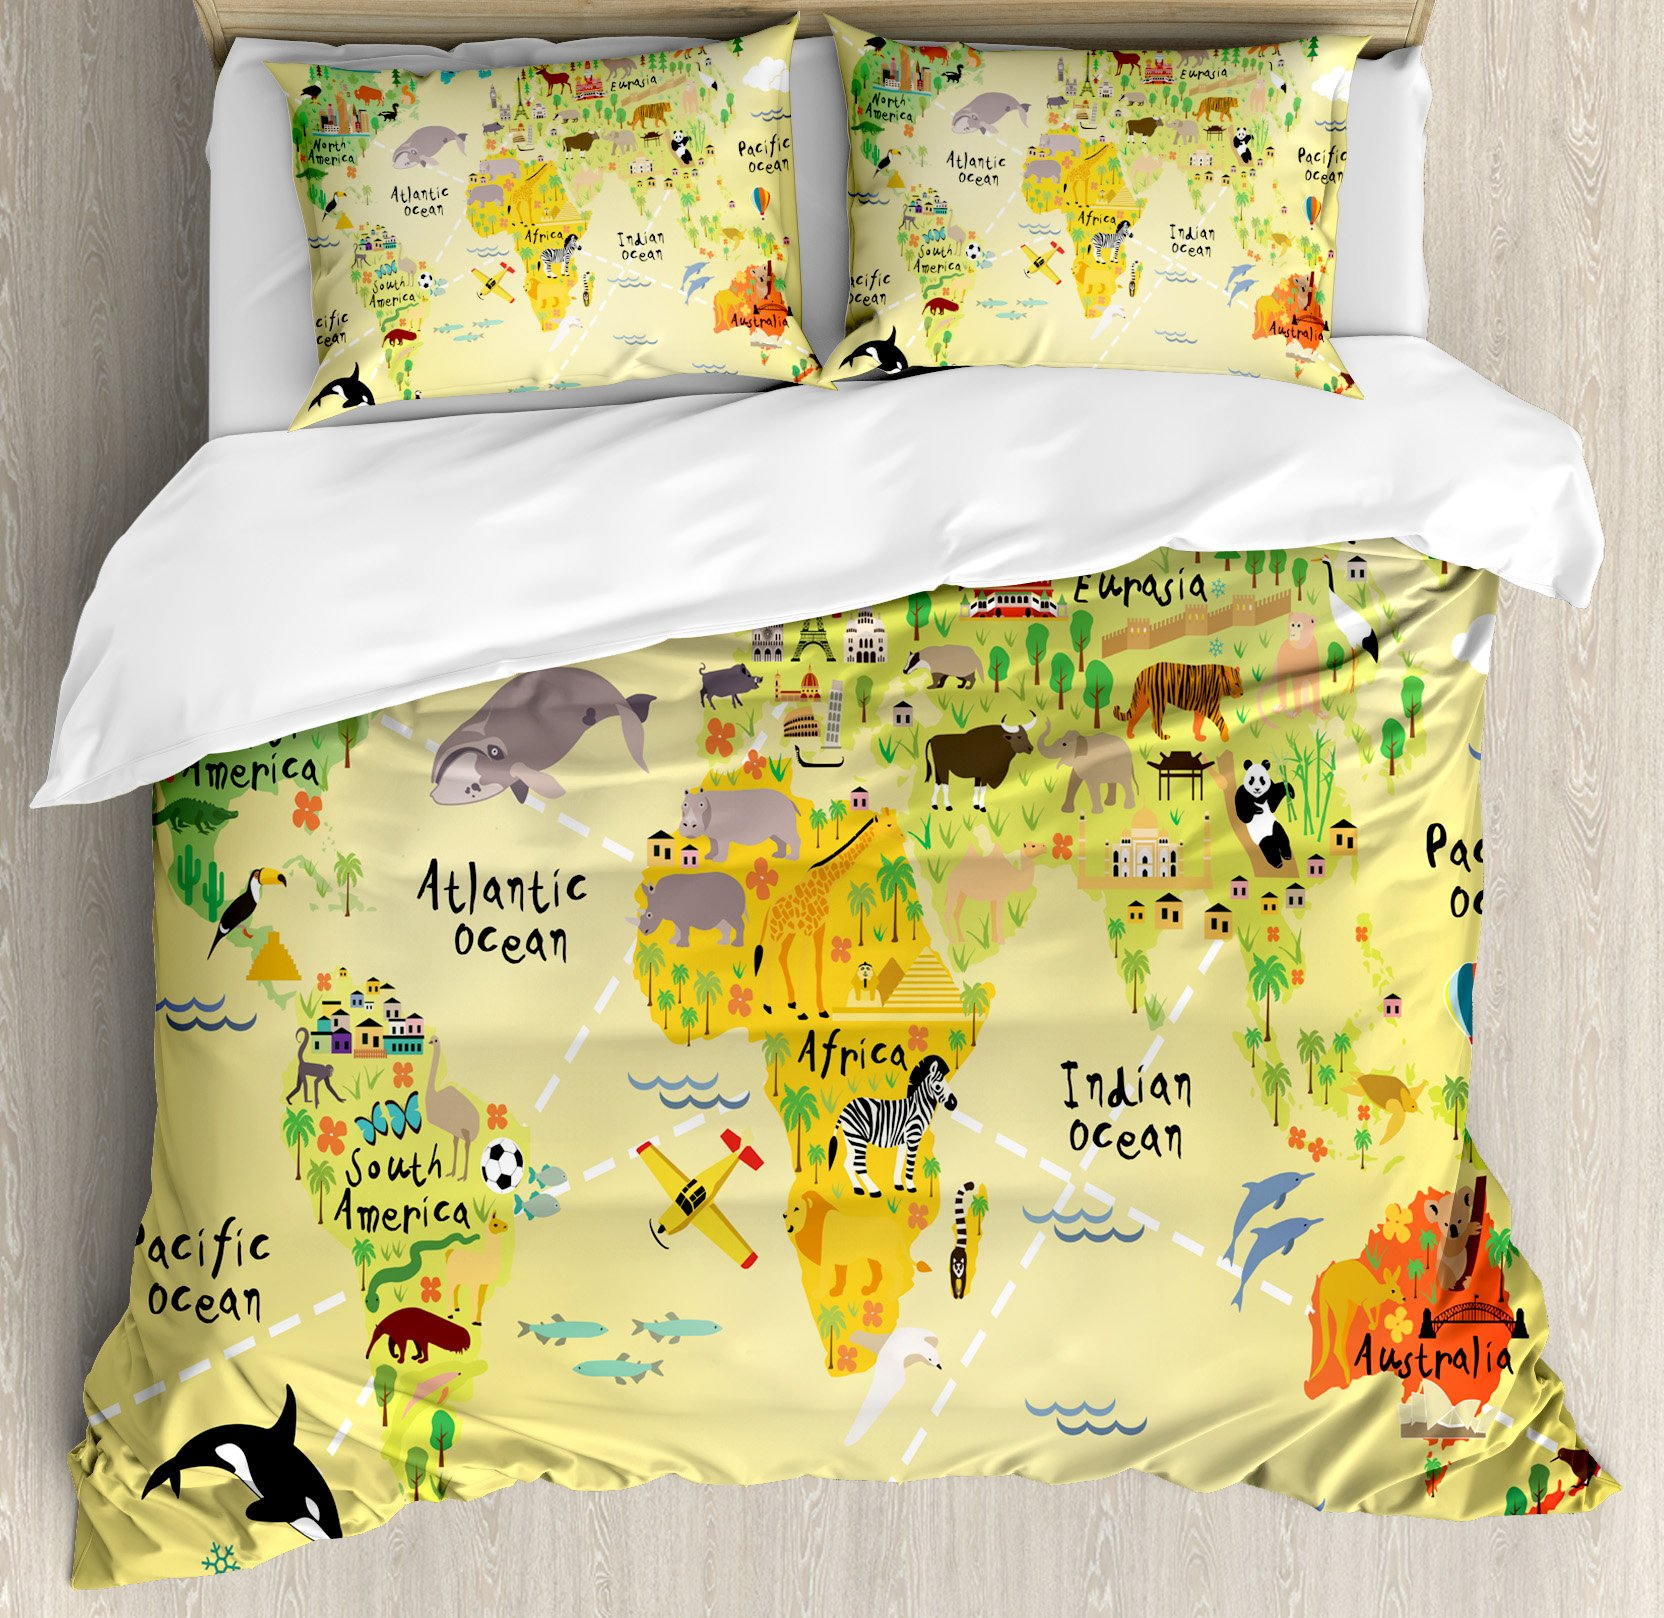 Kids Decor Duvet Cover Set Queen Size by Ambesonne, Educational World Map Africa America Penguins Atlantic Pacific Ocean Animals Australia Panda, Decorative 3 Piece Bedding Set with 2 Pillow Shams